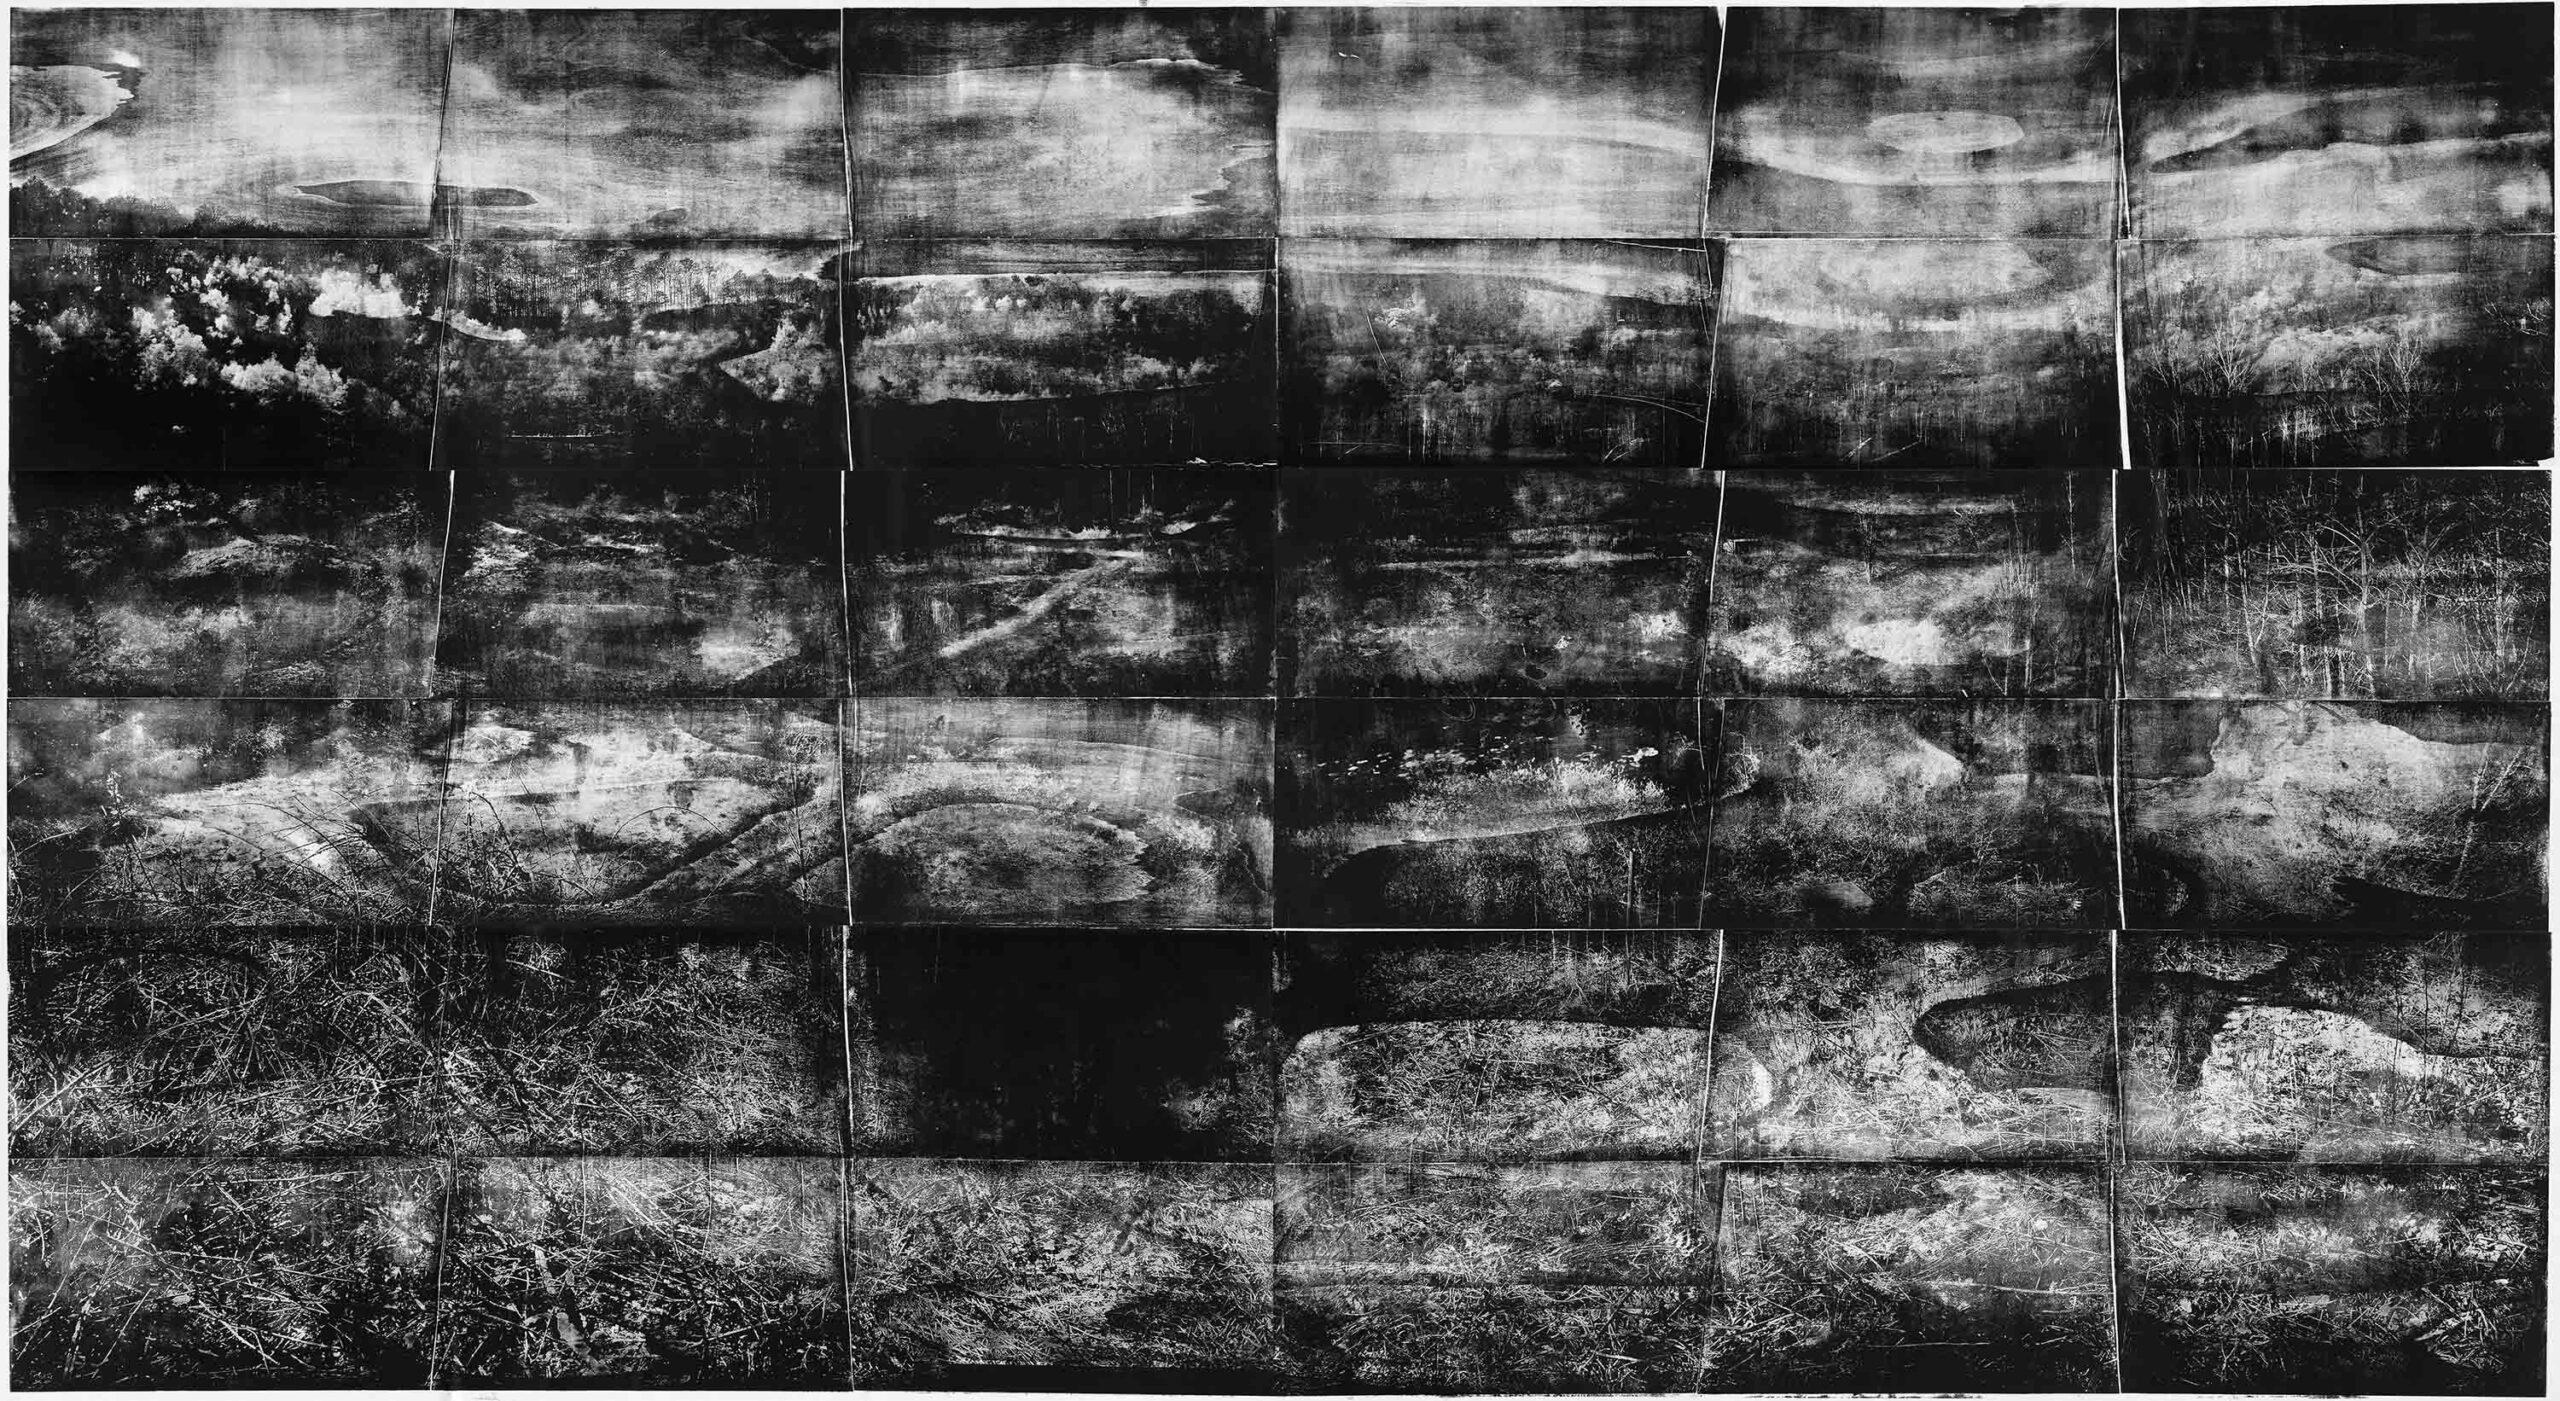 Messel 1 (Tiefschlaf), 2019, wood engraving, 289 x 520,9 cm, Genaro Strobel